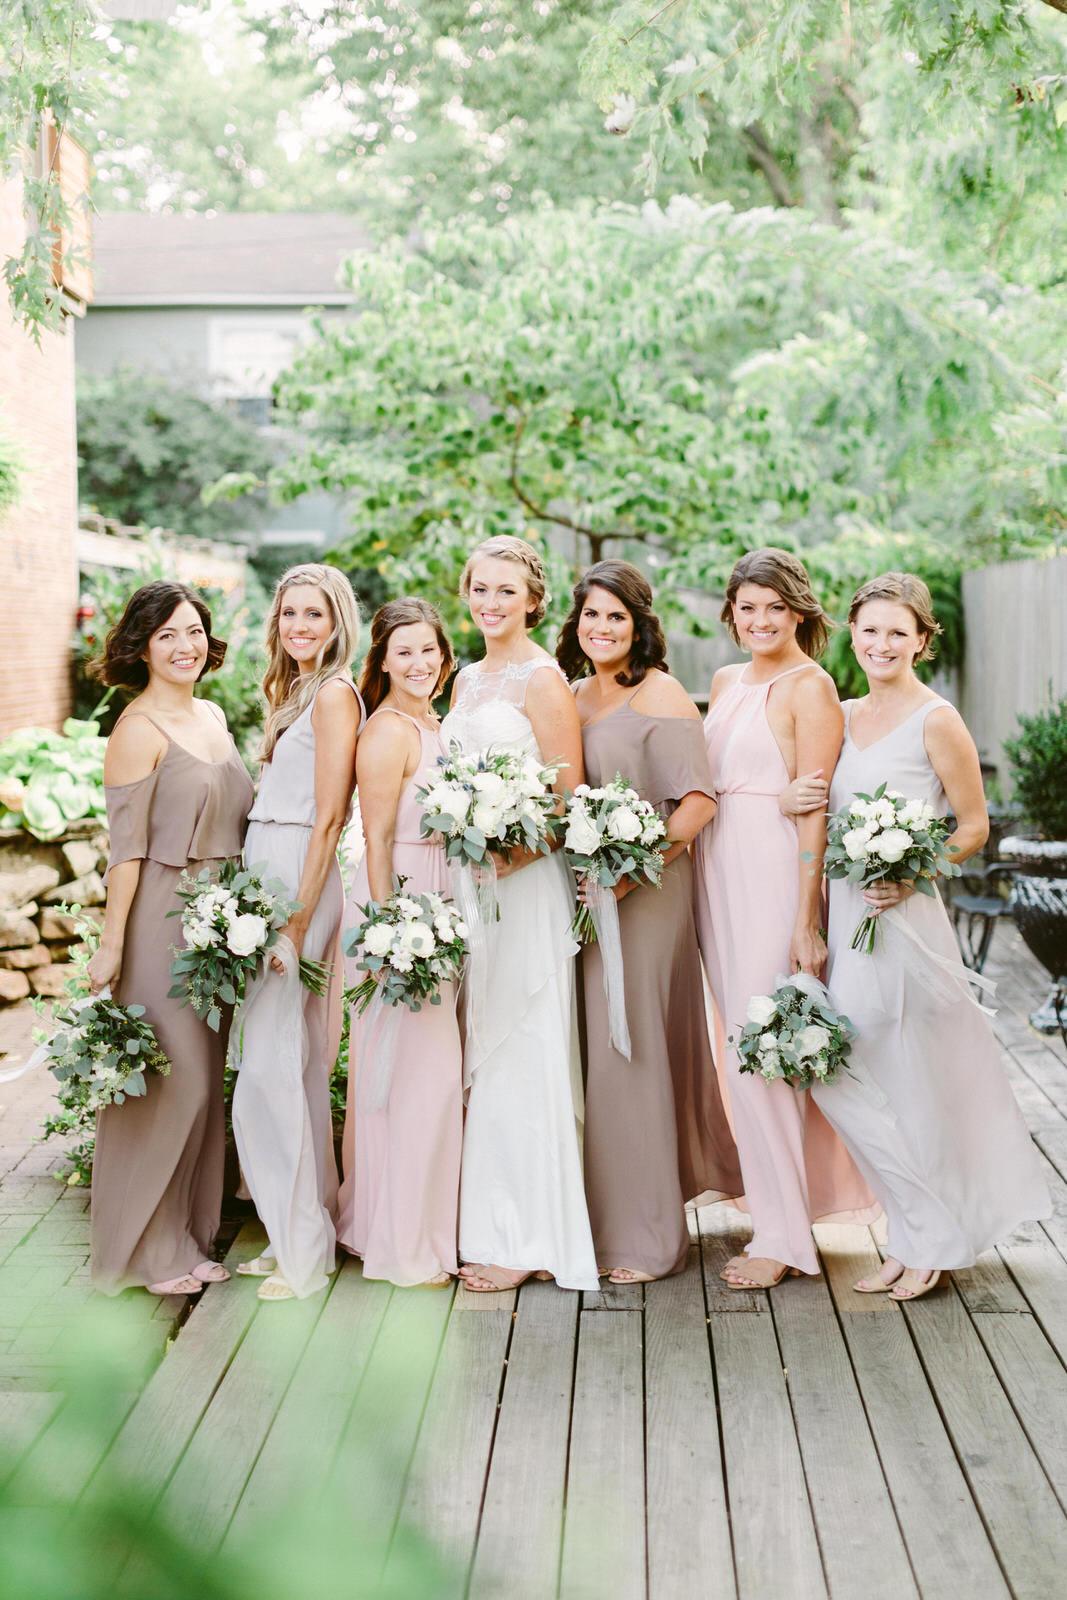 KatiMallory-Fayetteville Wedding Florist-2085.JPG